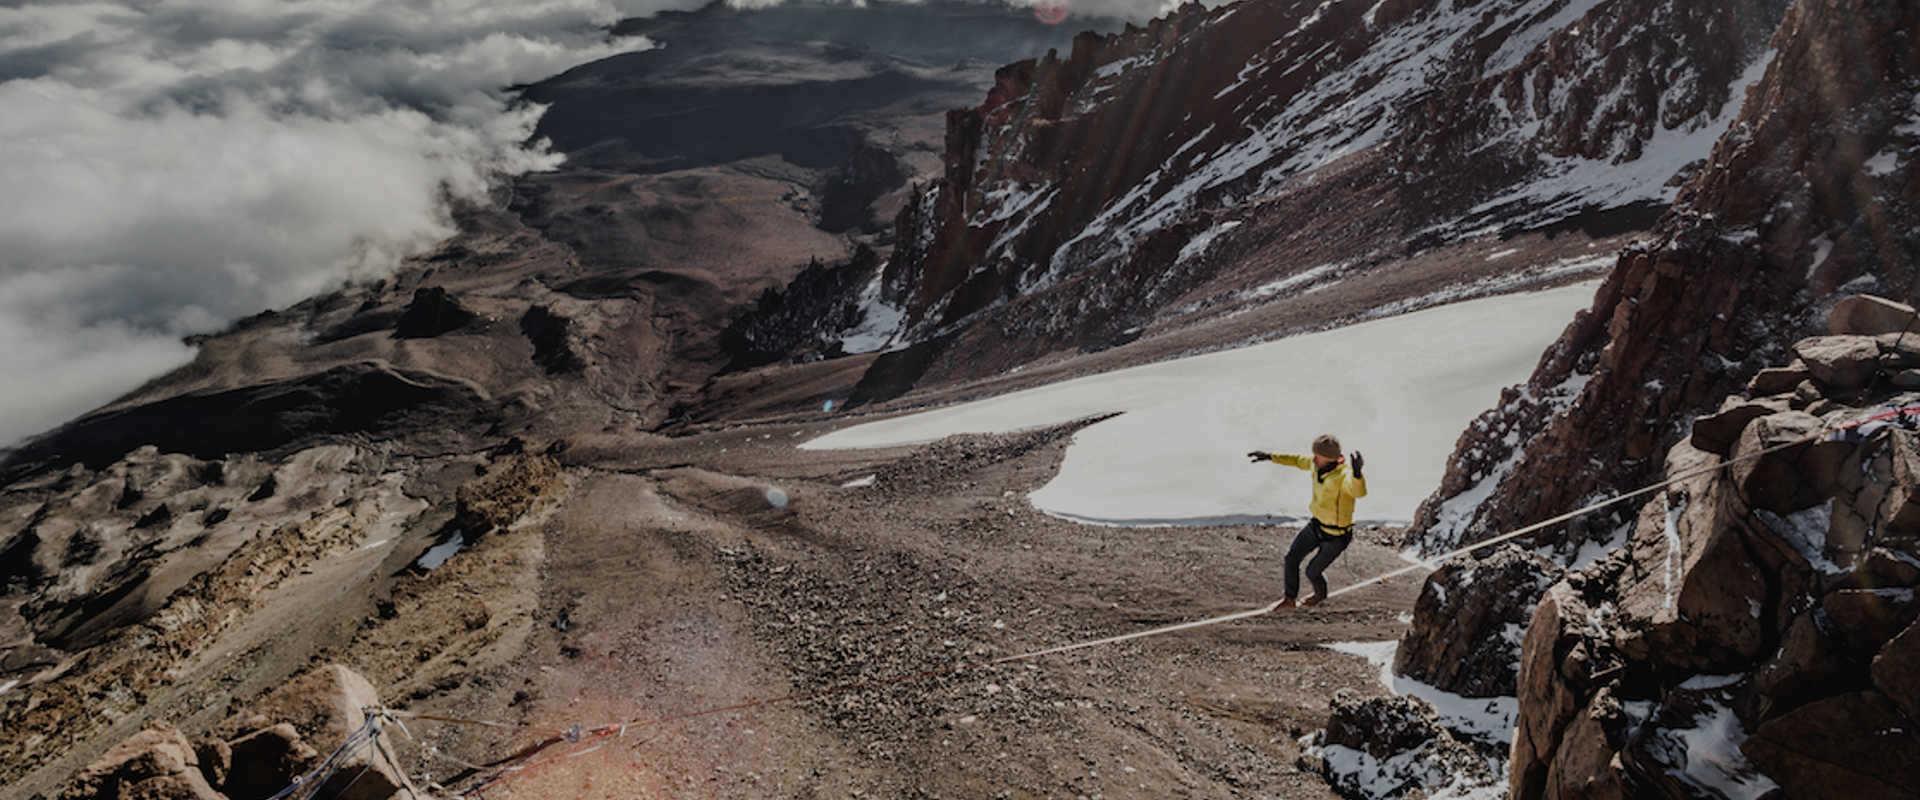 Stephan Siegrist sets new high line record on Mount Kilimanjaro